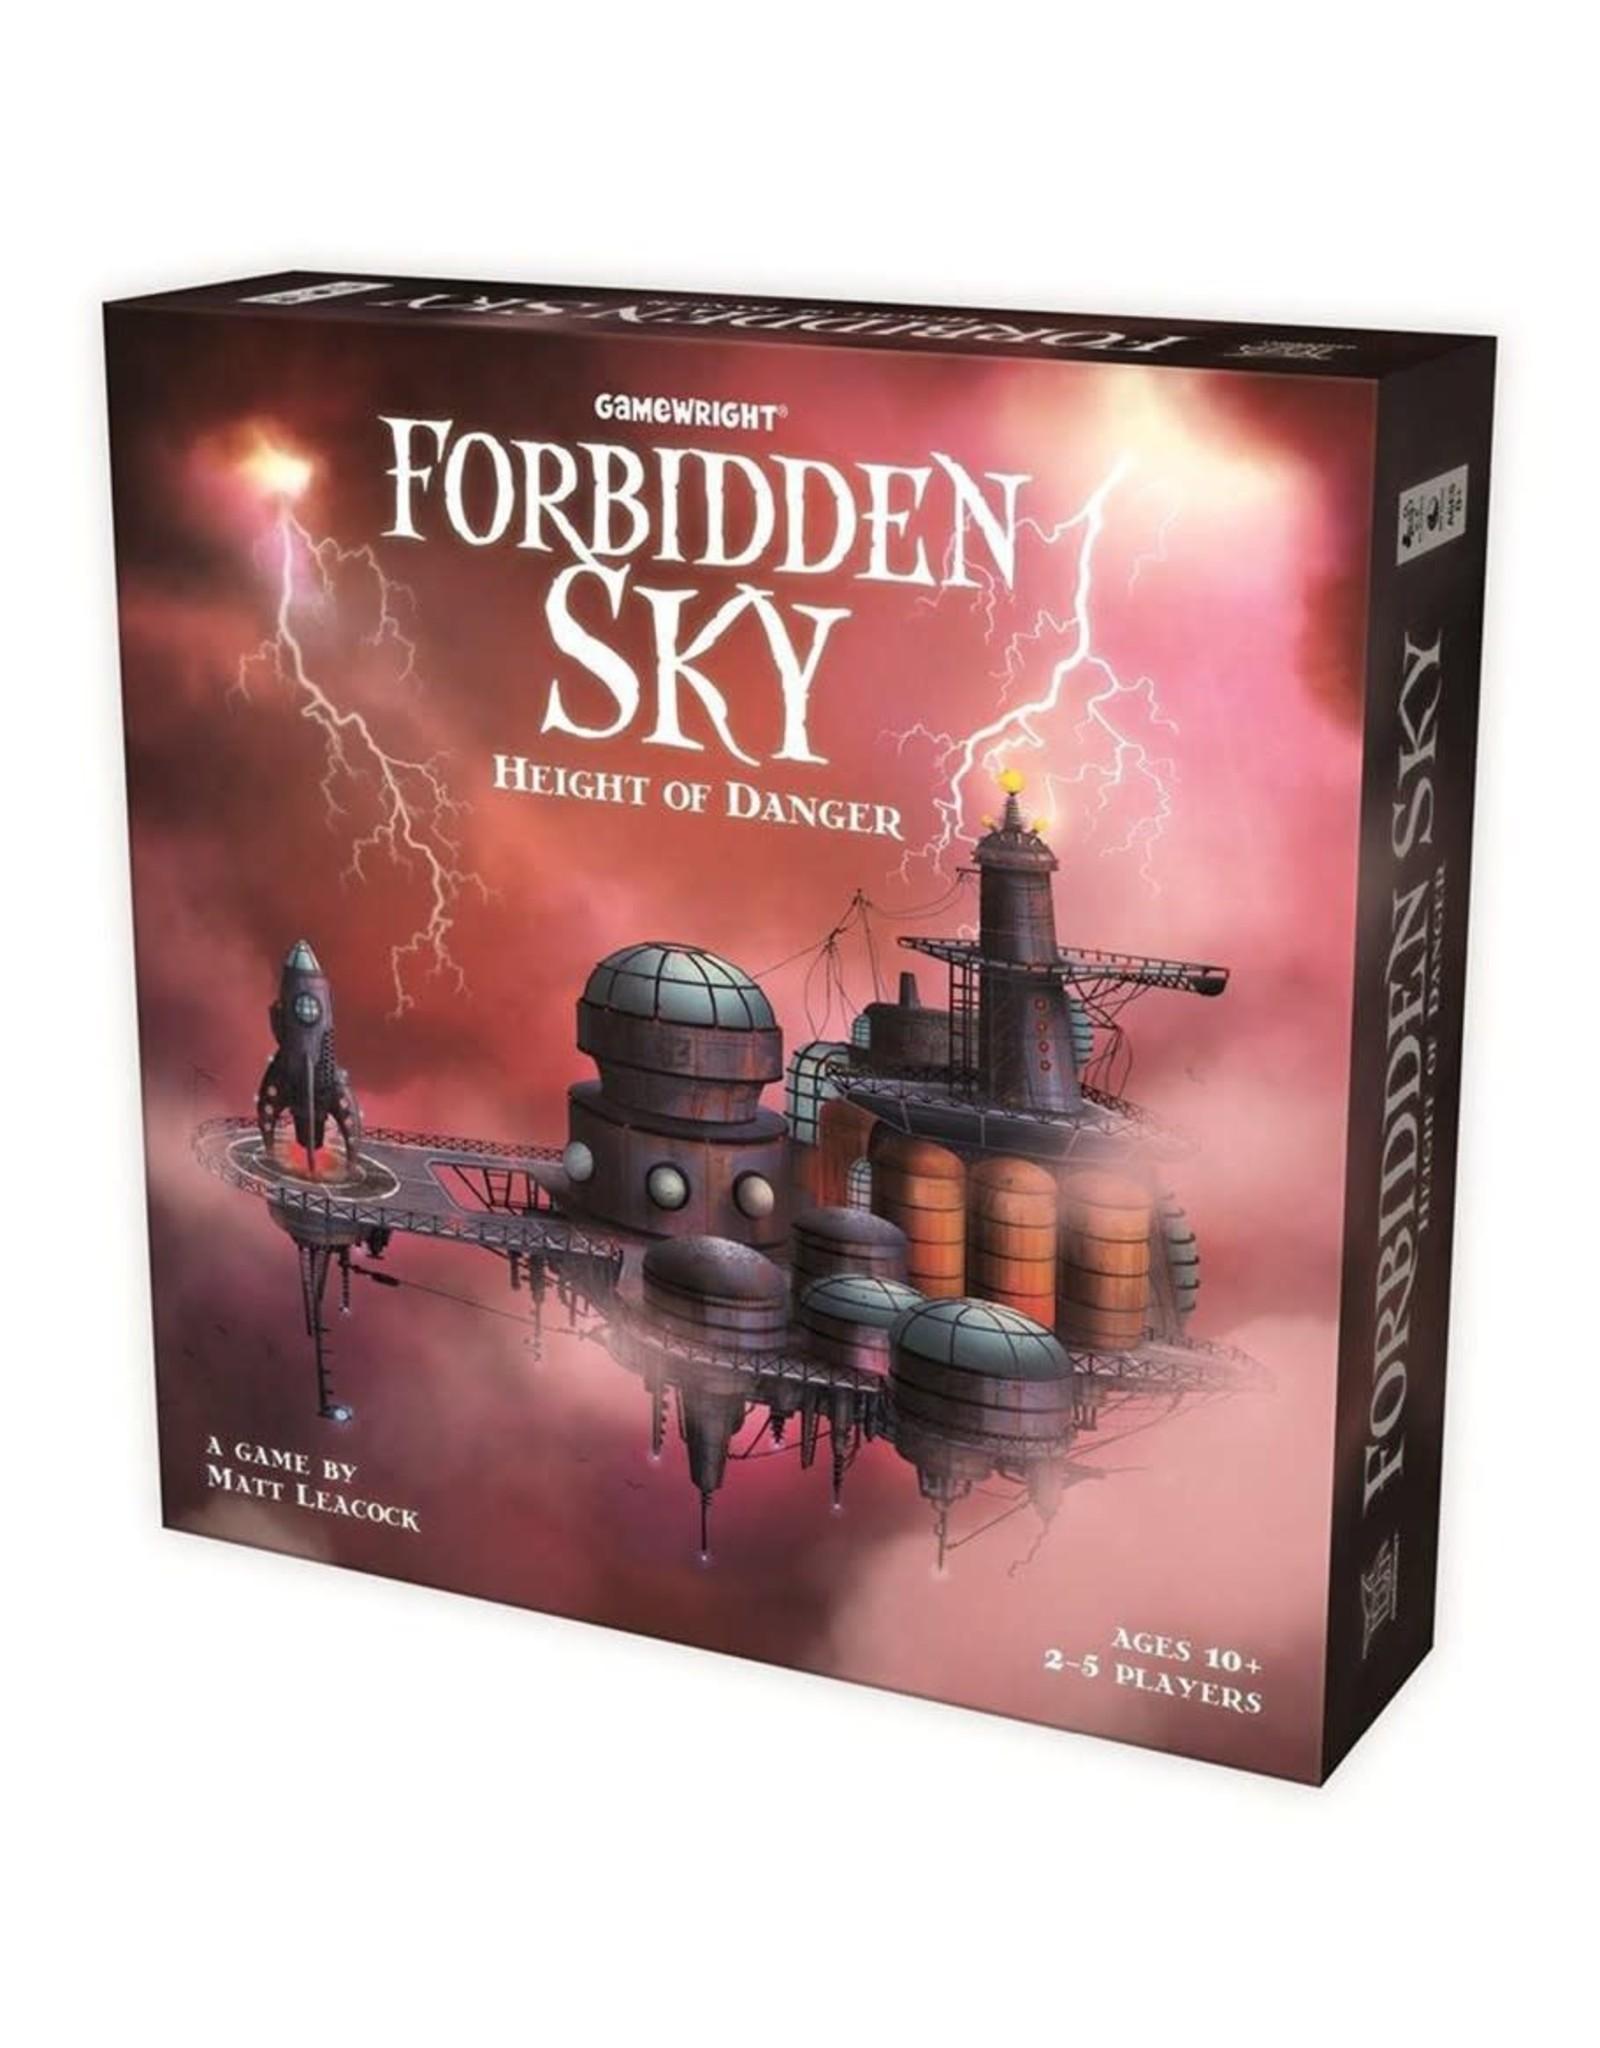 Gamewright Forbidden Sky: Height of Danger